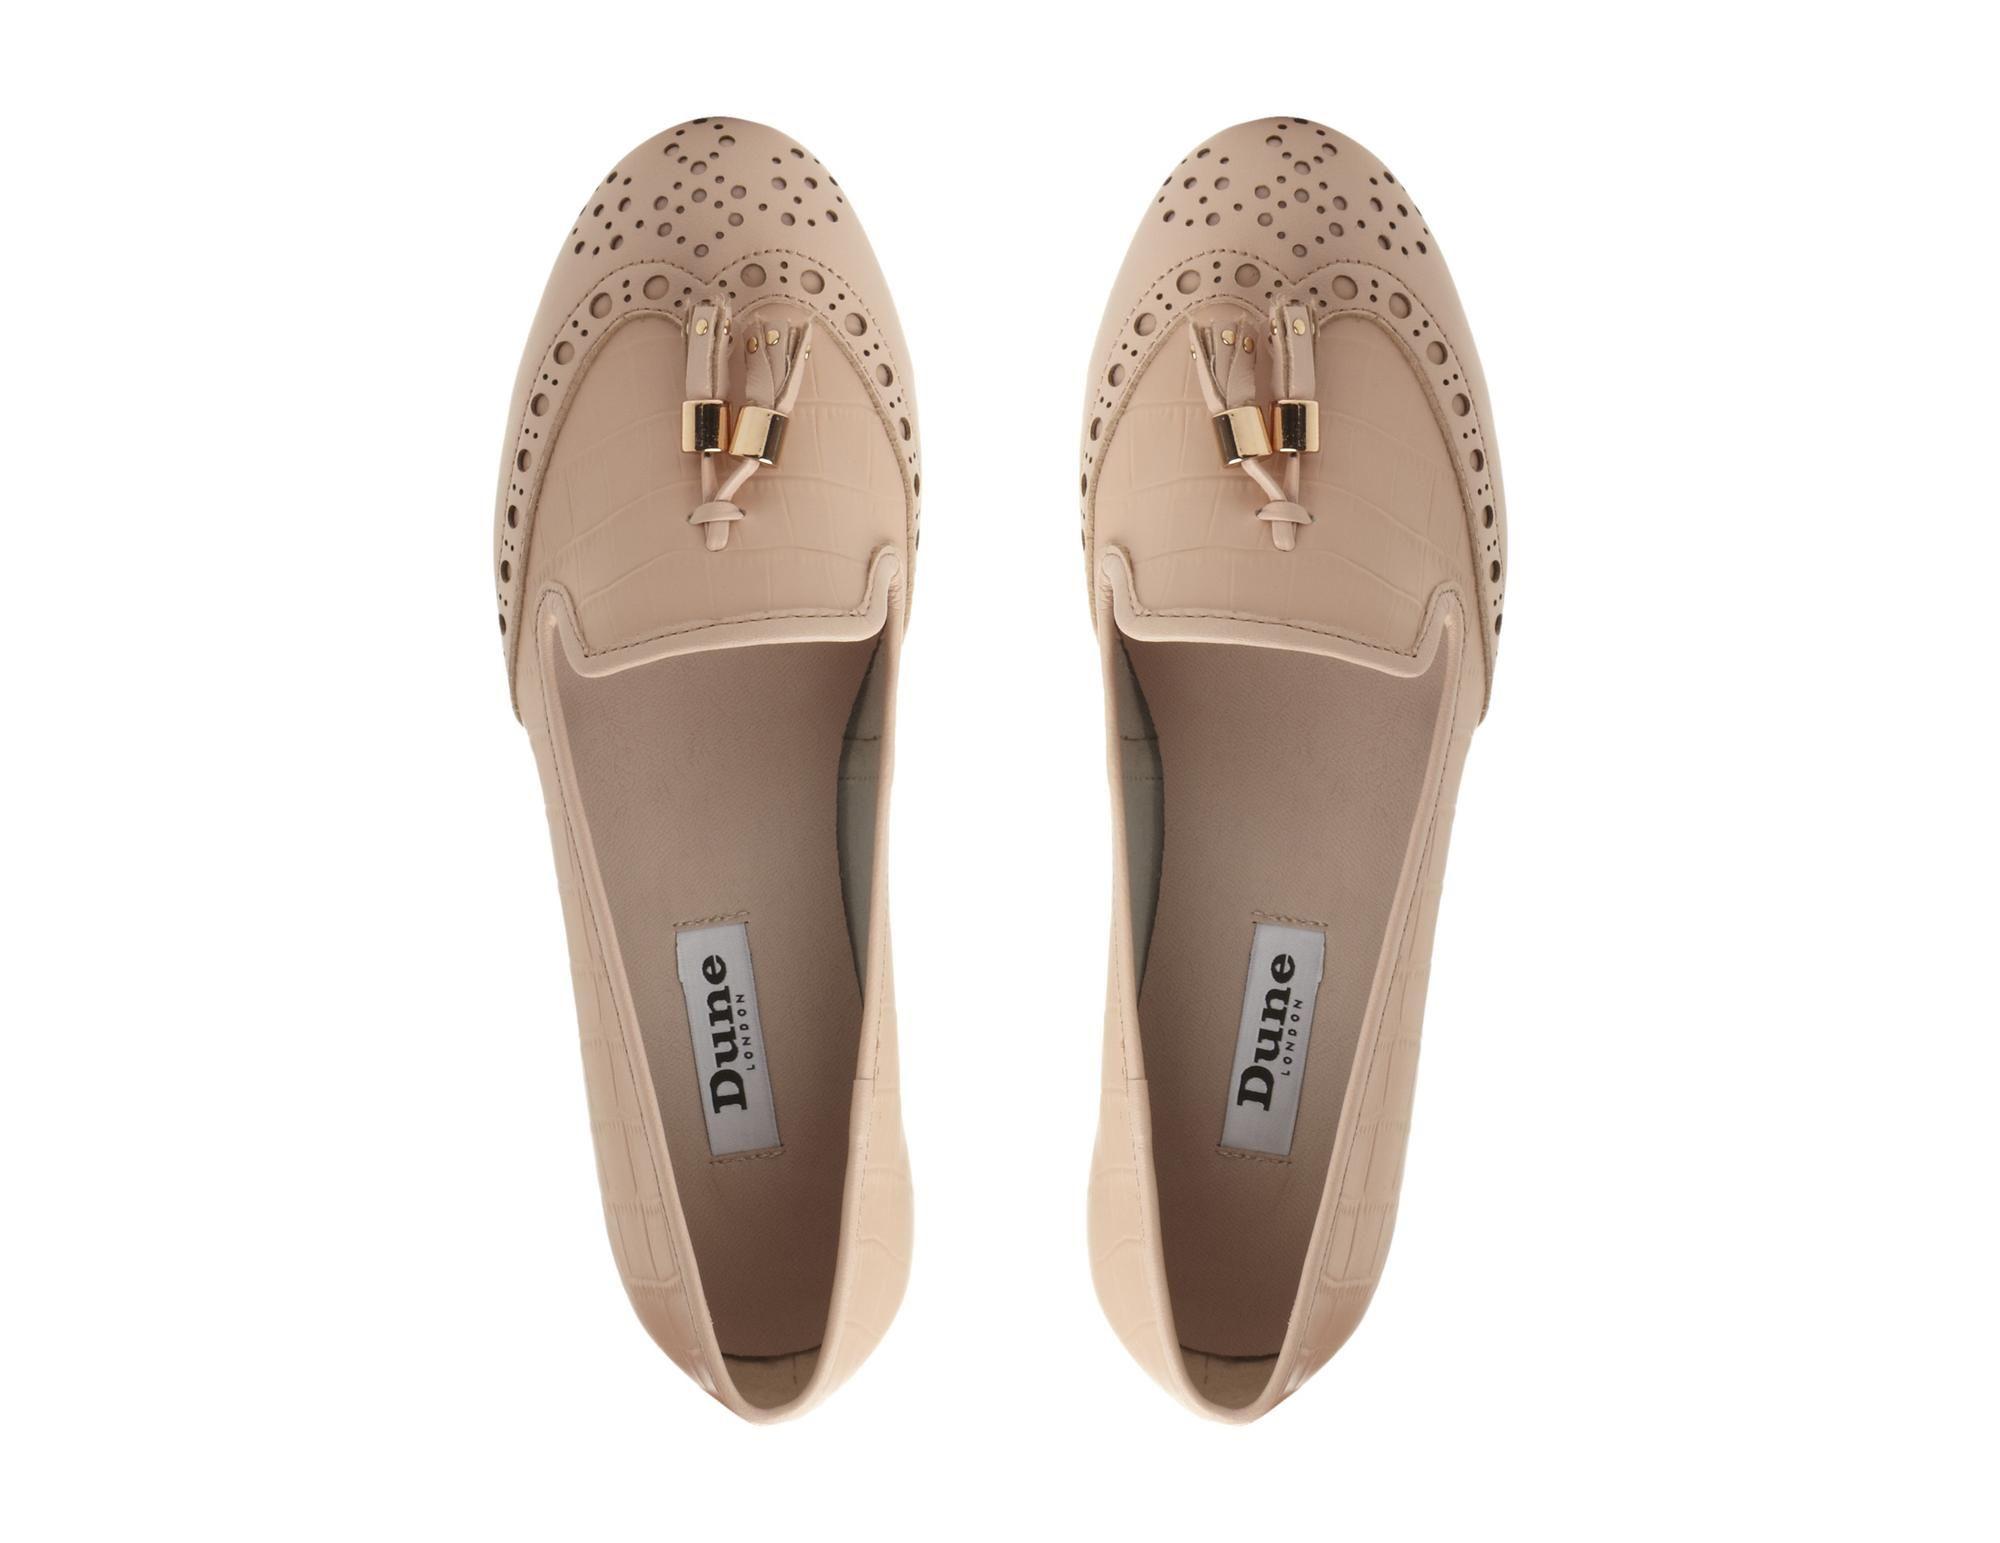 2cb11debca9 DUNE LADIES LOKI - Brogue Tassel Detail Loafer - pink